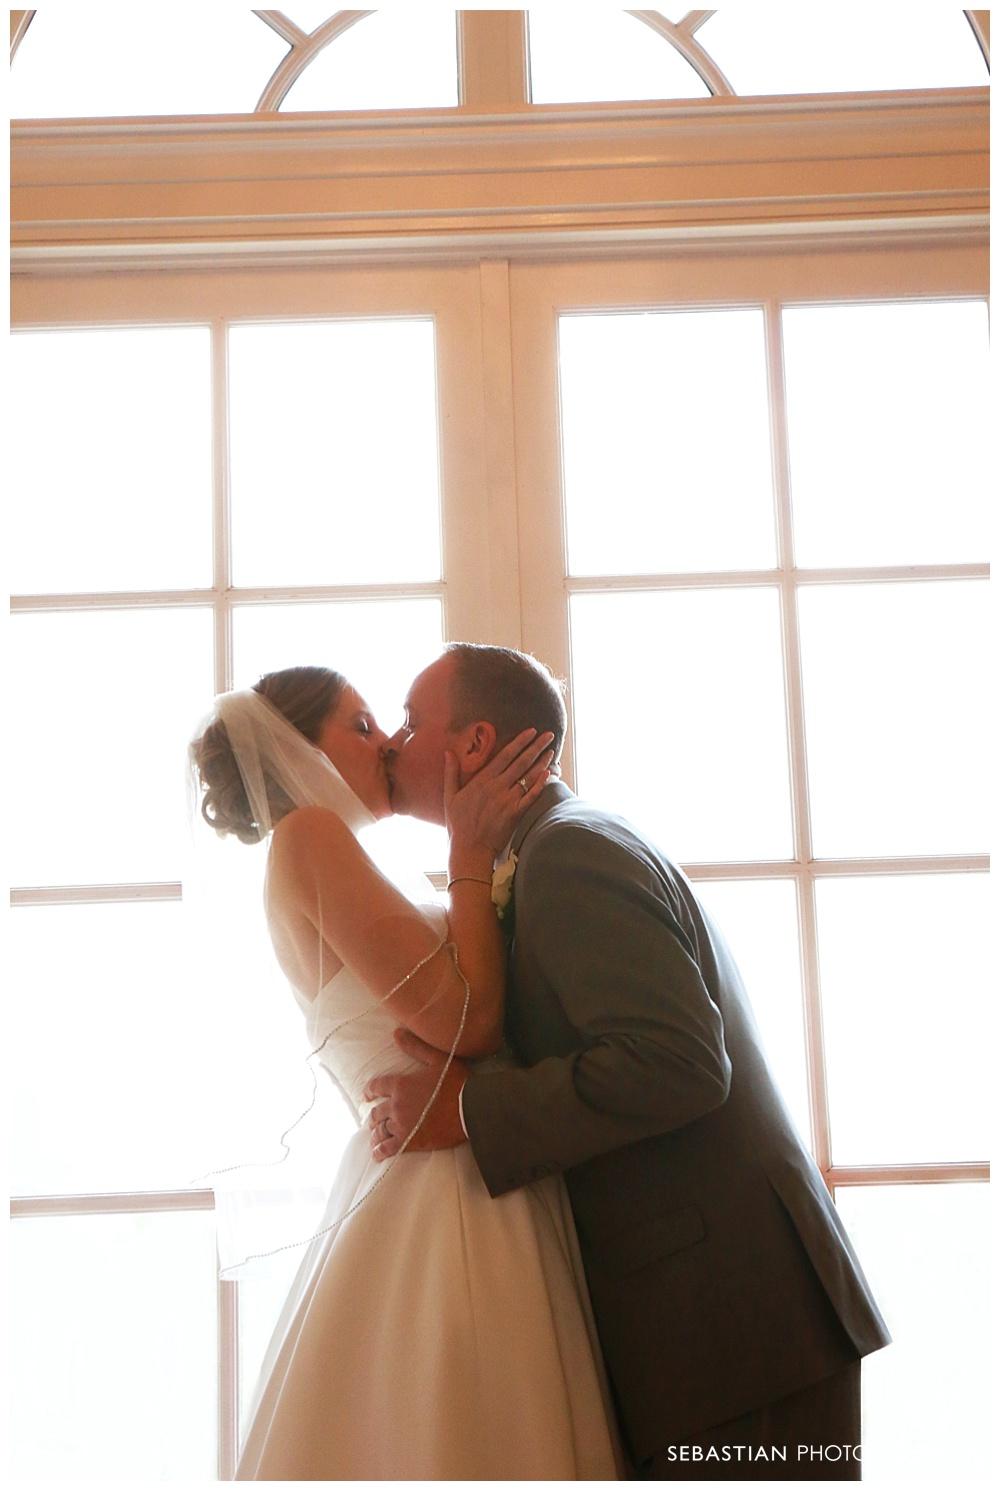 Sebastian_Photography_Wadsworth_Mansion_Middletown_CT_Wedding_Portraits_Spring30.jpg